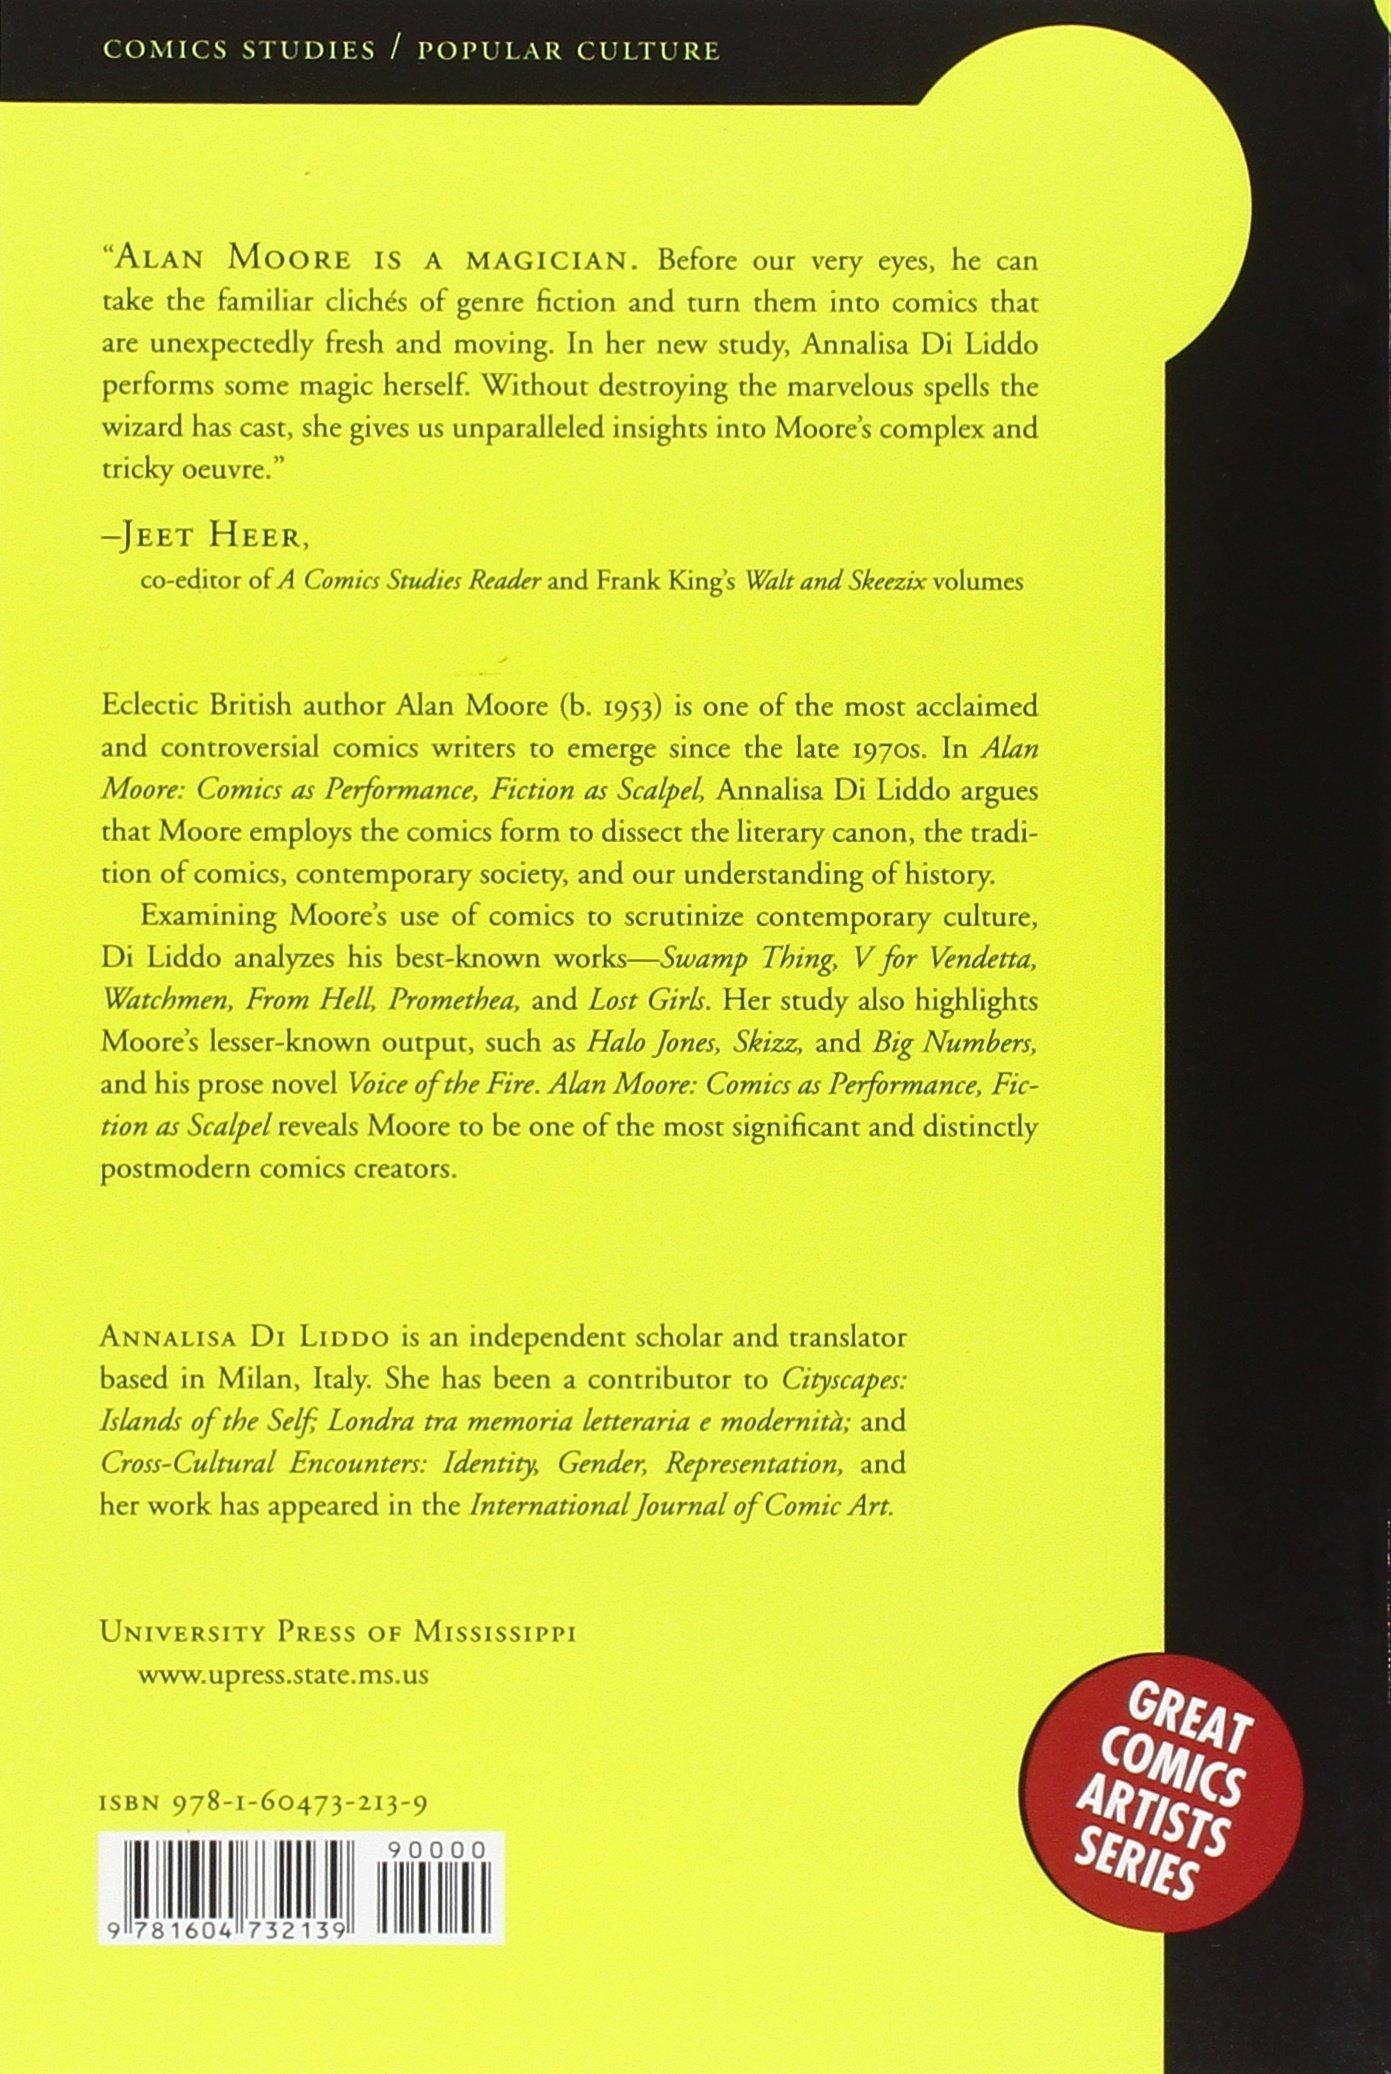 Alan Moore: Comics as Performance, Fiction as Scalpel (Great Comics Artists Series)